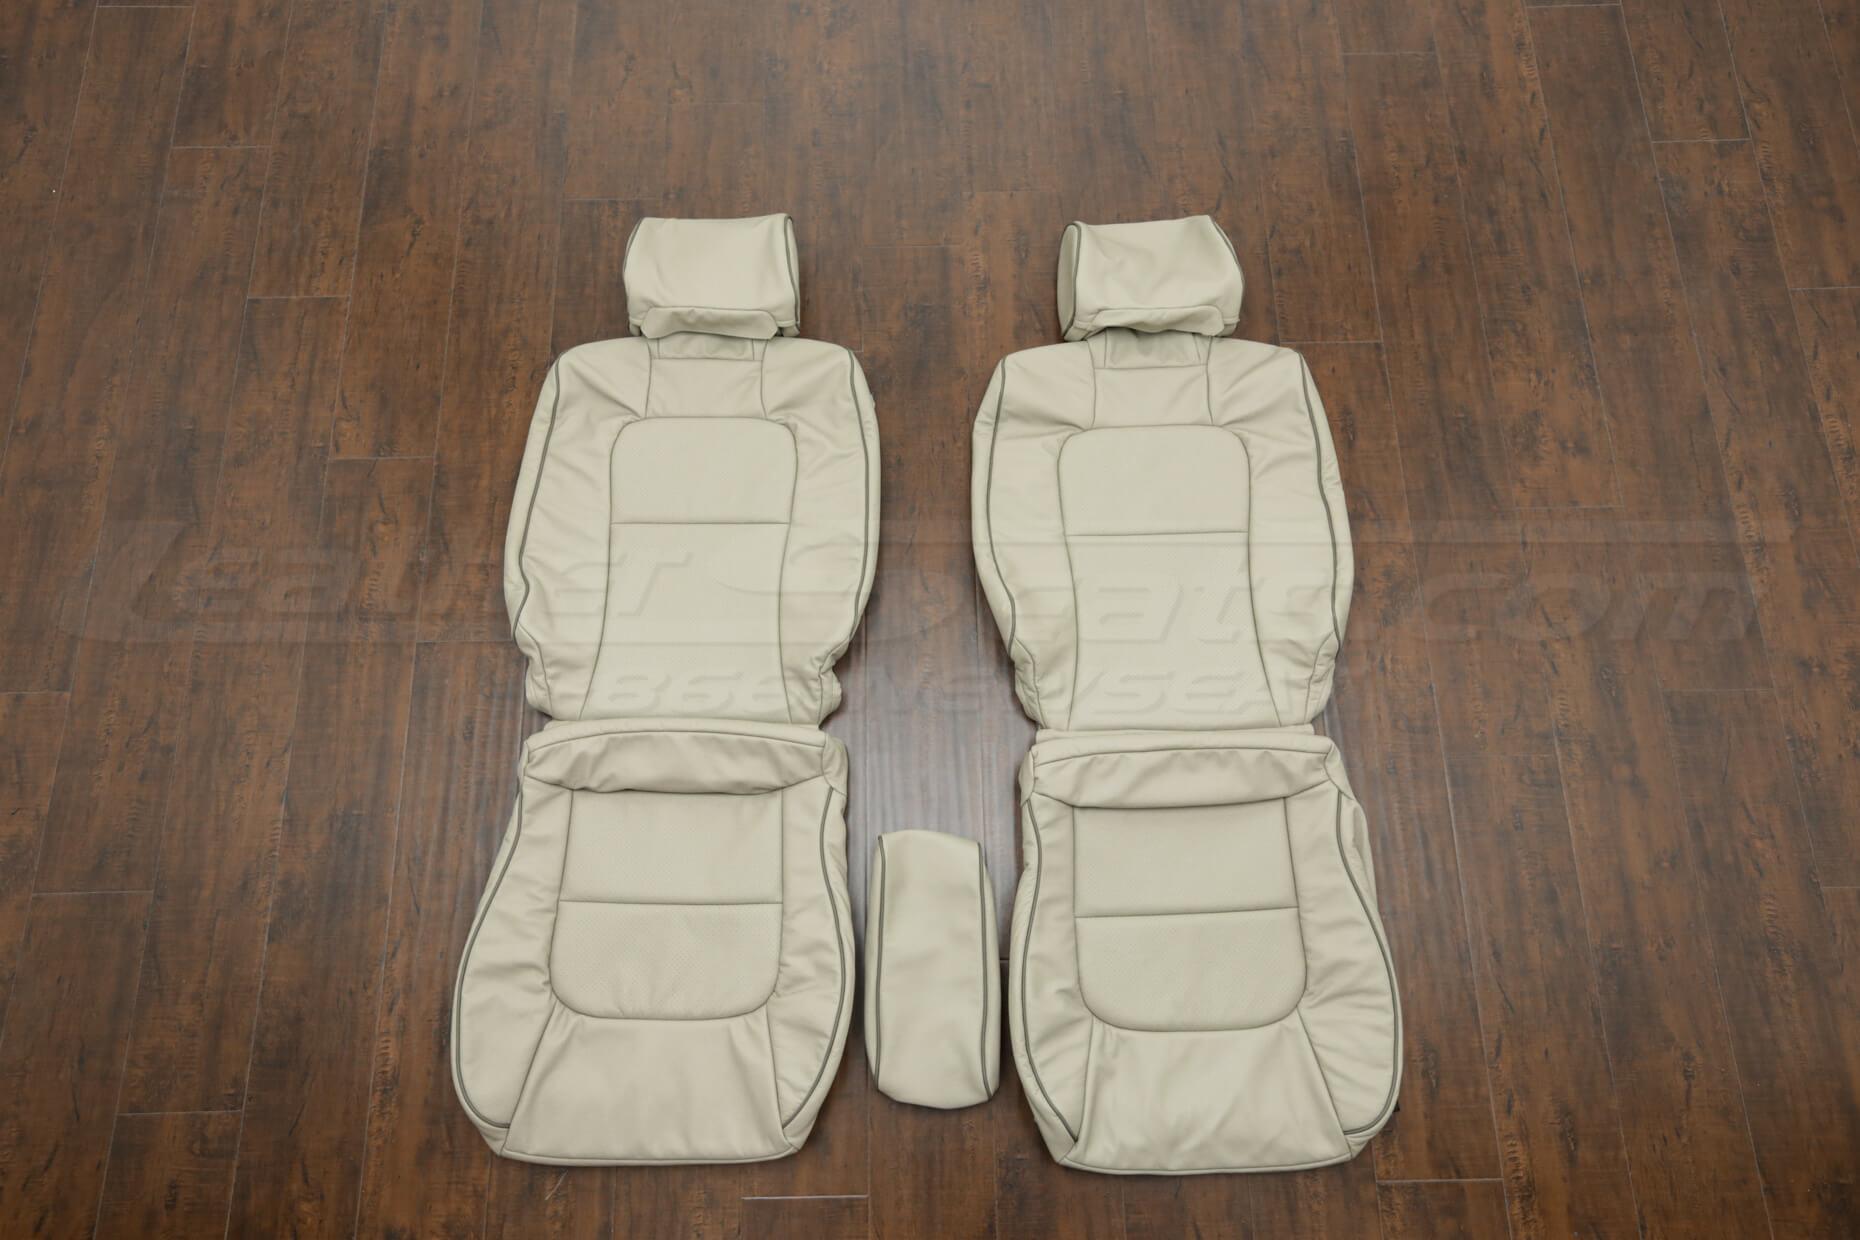 Lexus SC Upholstery Kit - Front seats